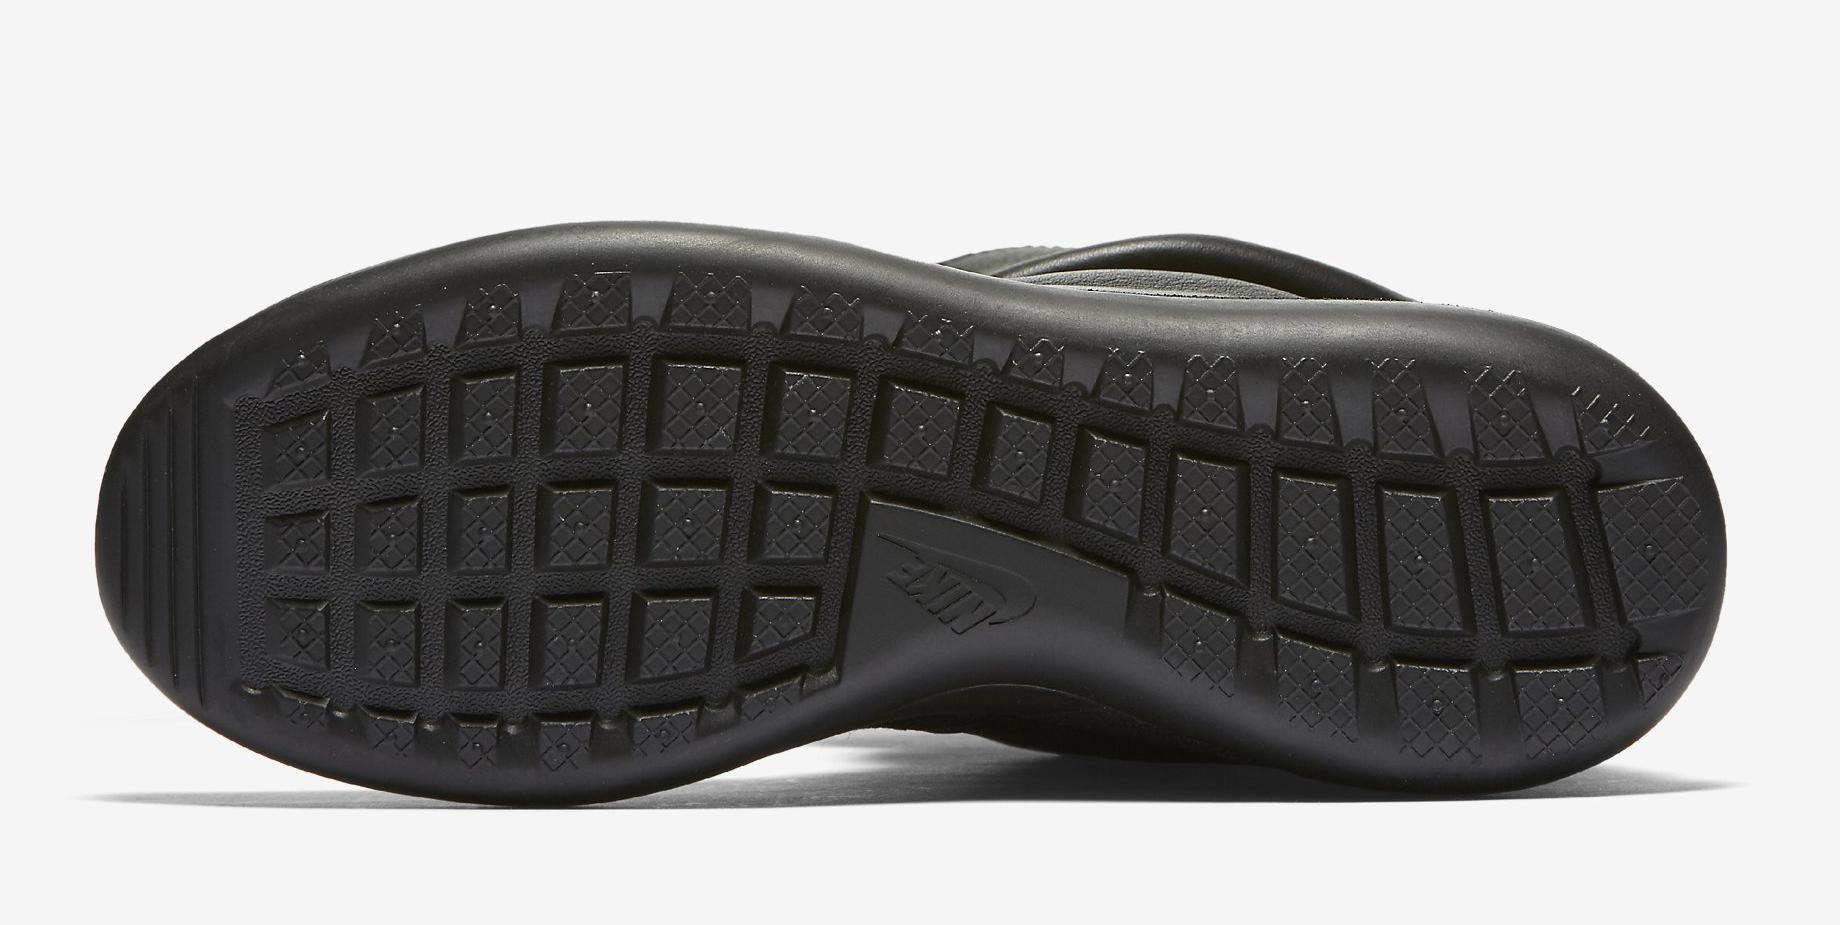 Nike Roshe 2 Hi Flyknit Womens Sole